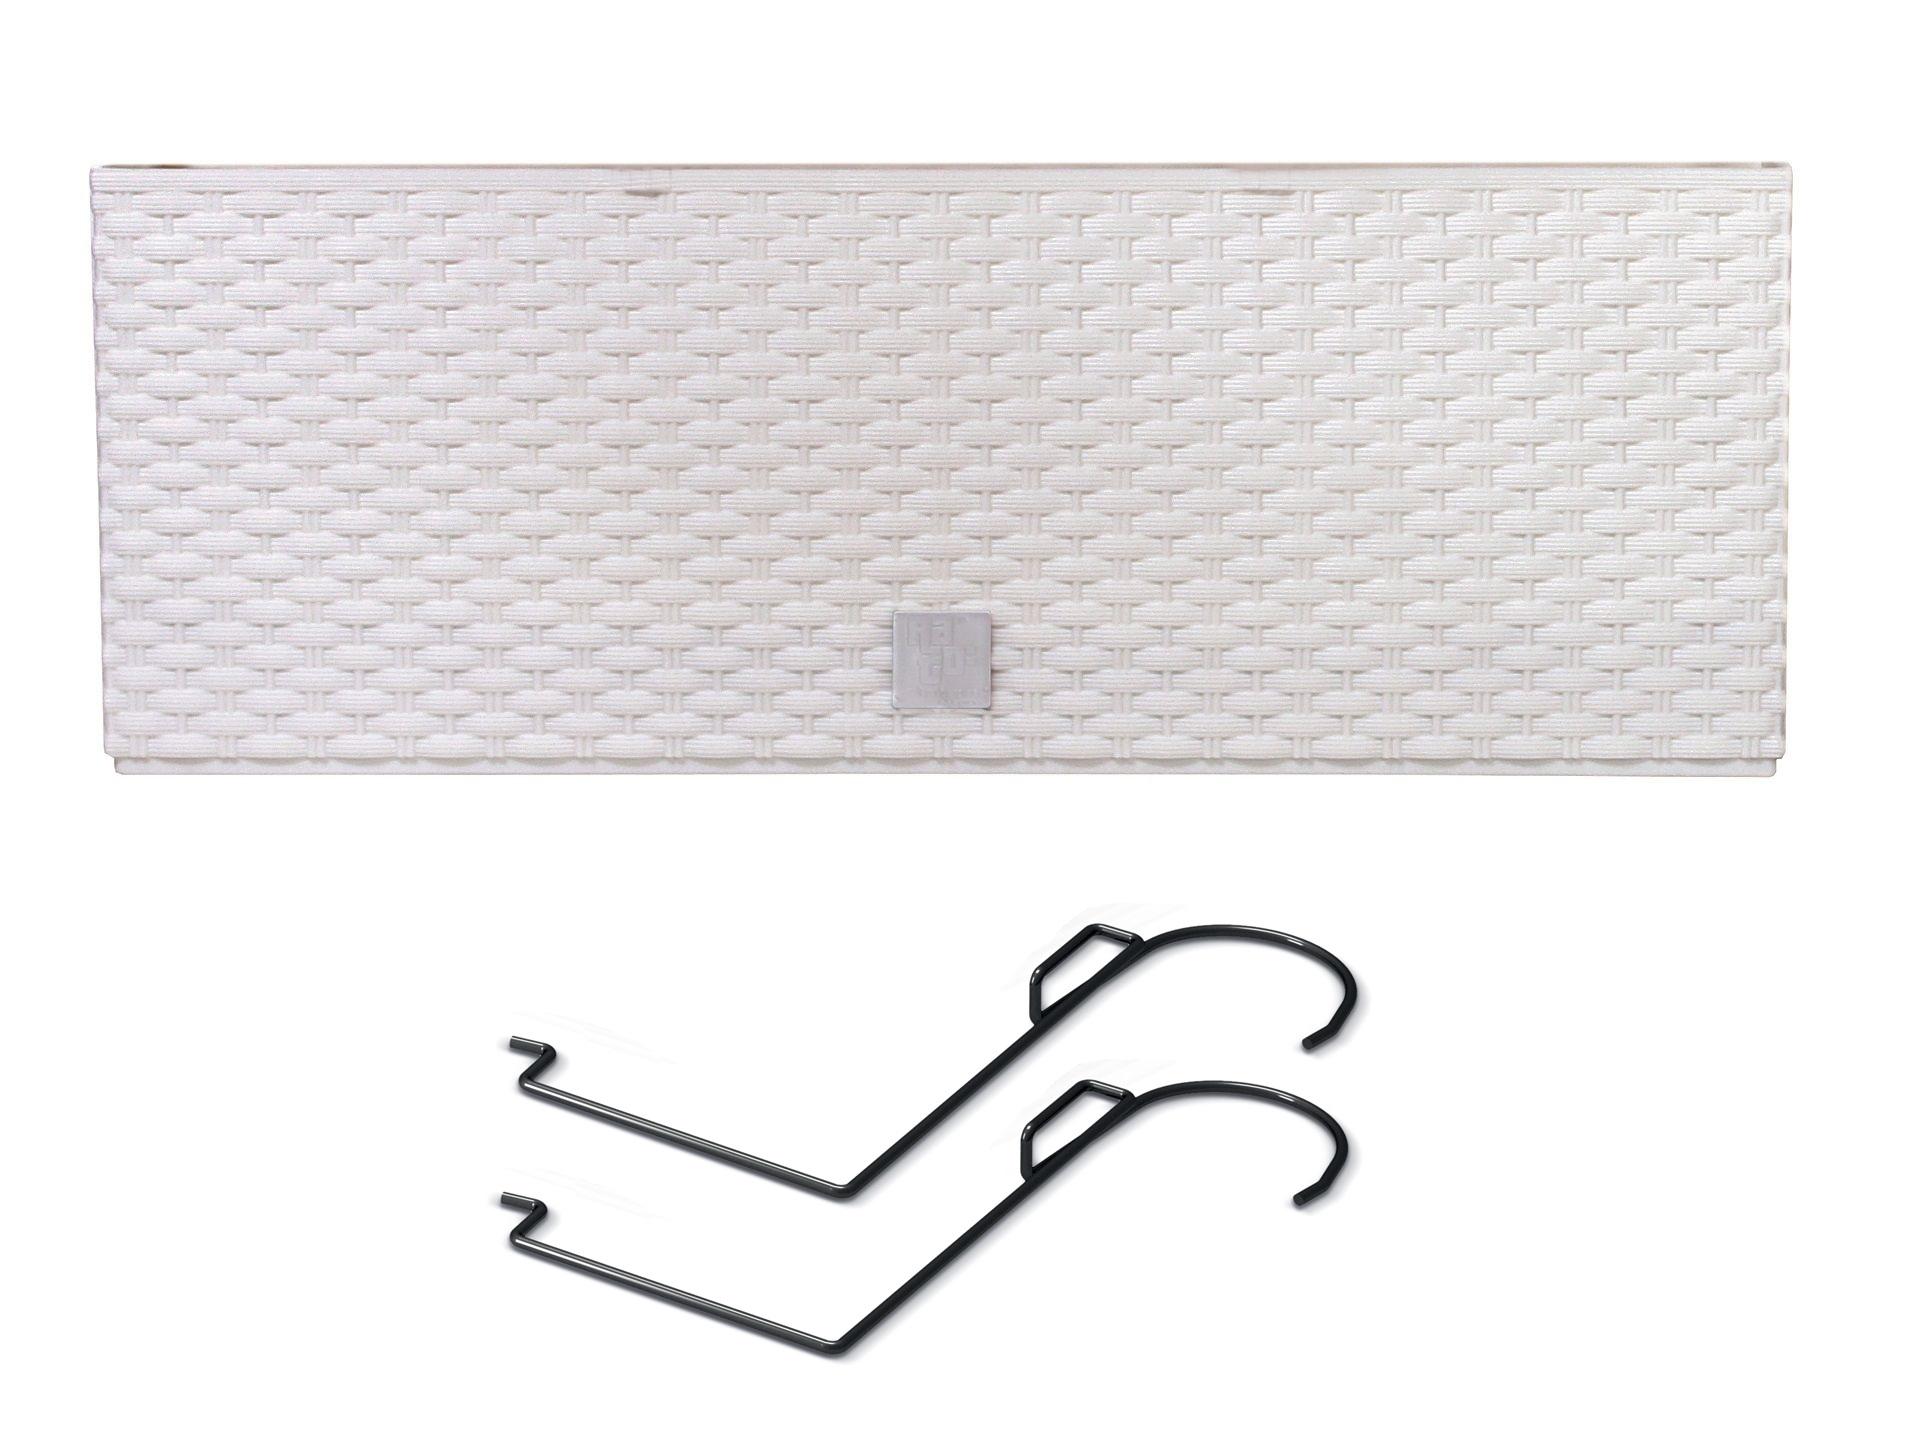 PROSPERPLAST Truhlík RATO CASE W s háky a vkladem bílý 39,5cm